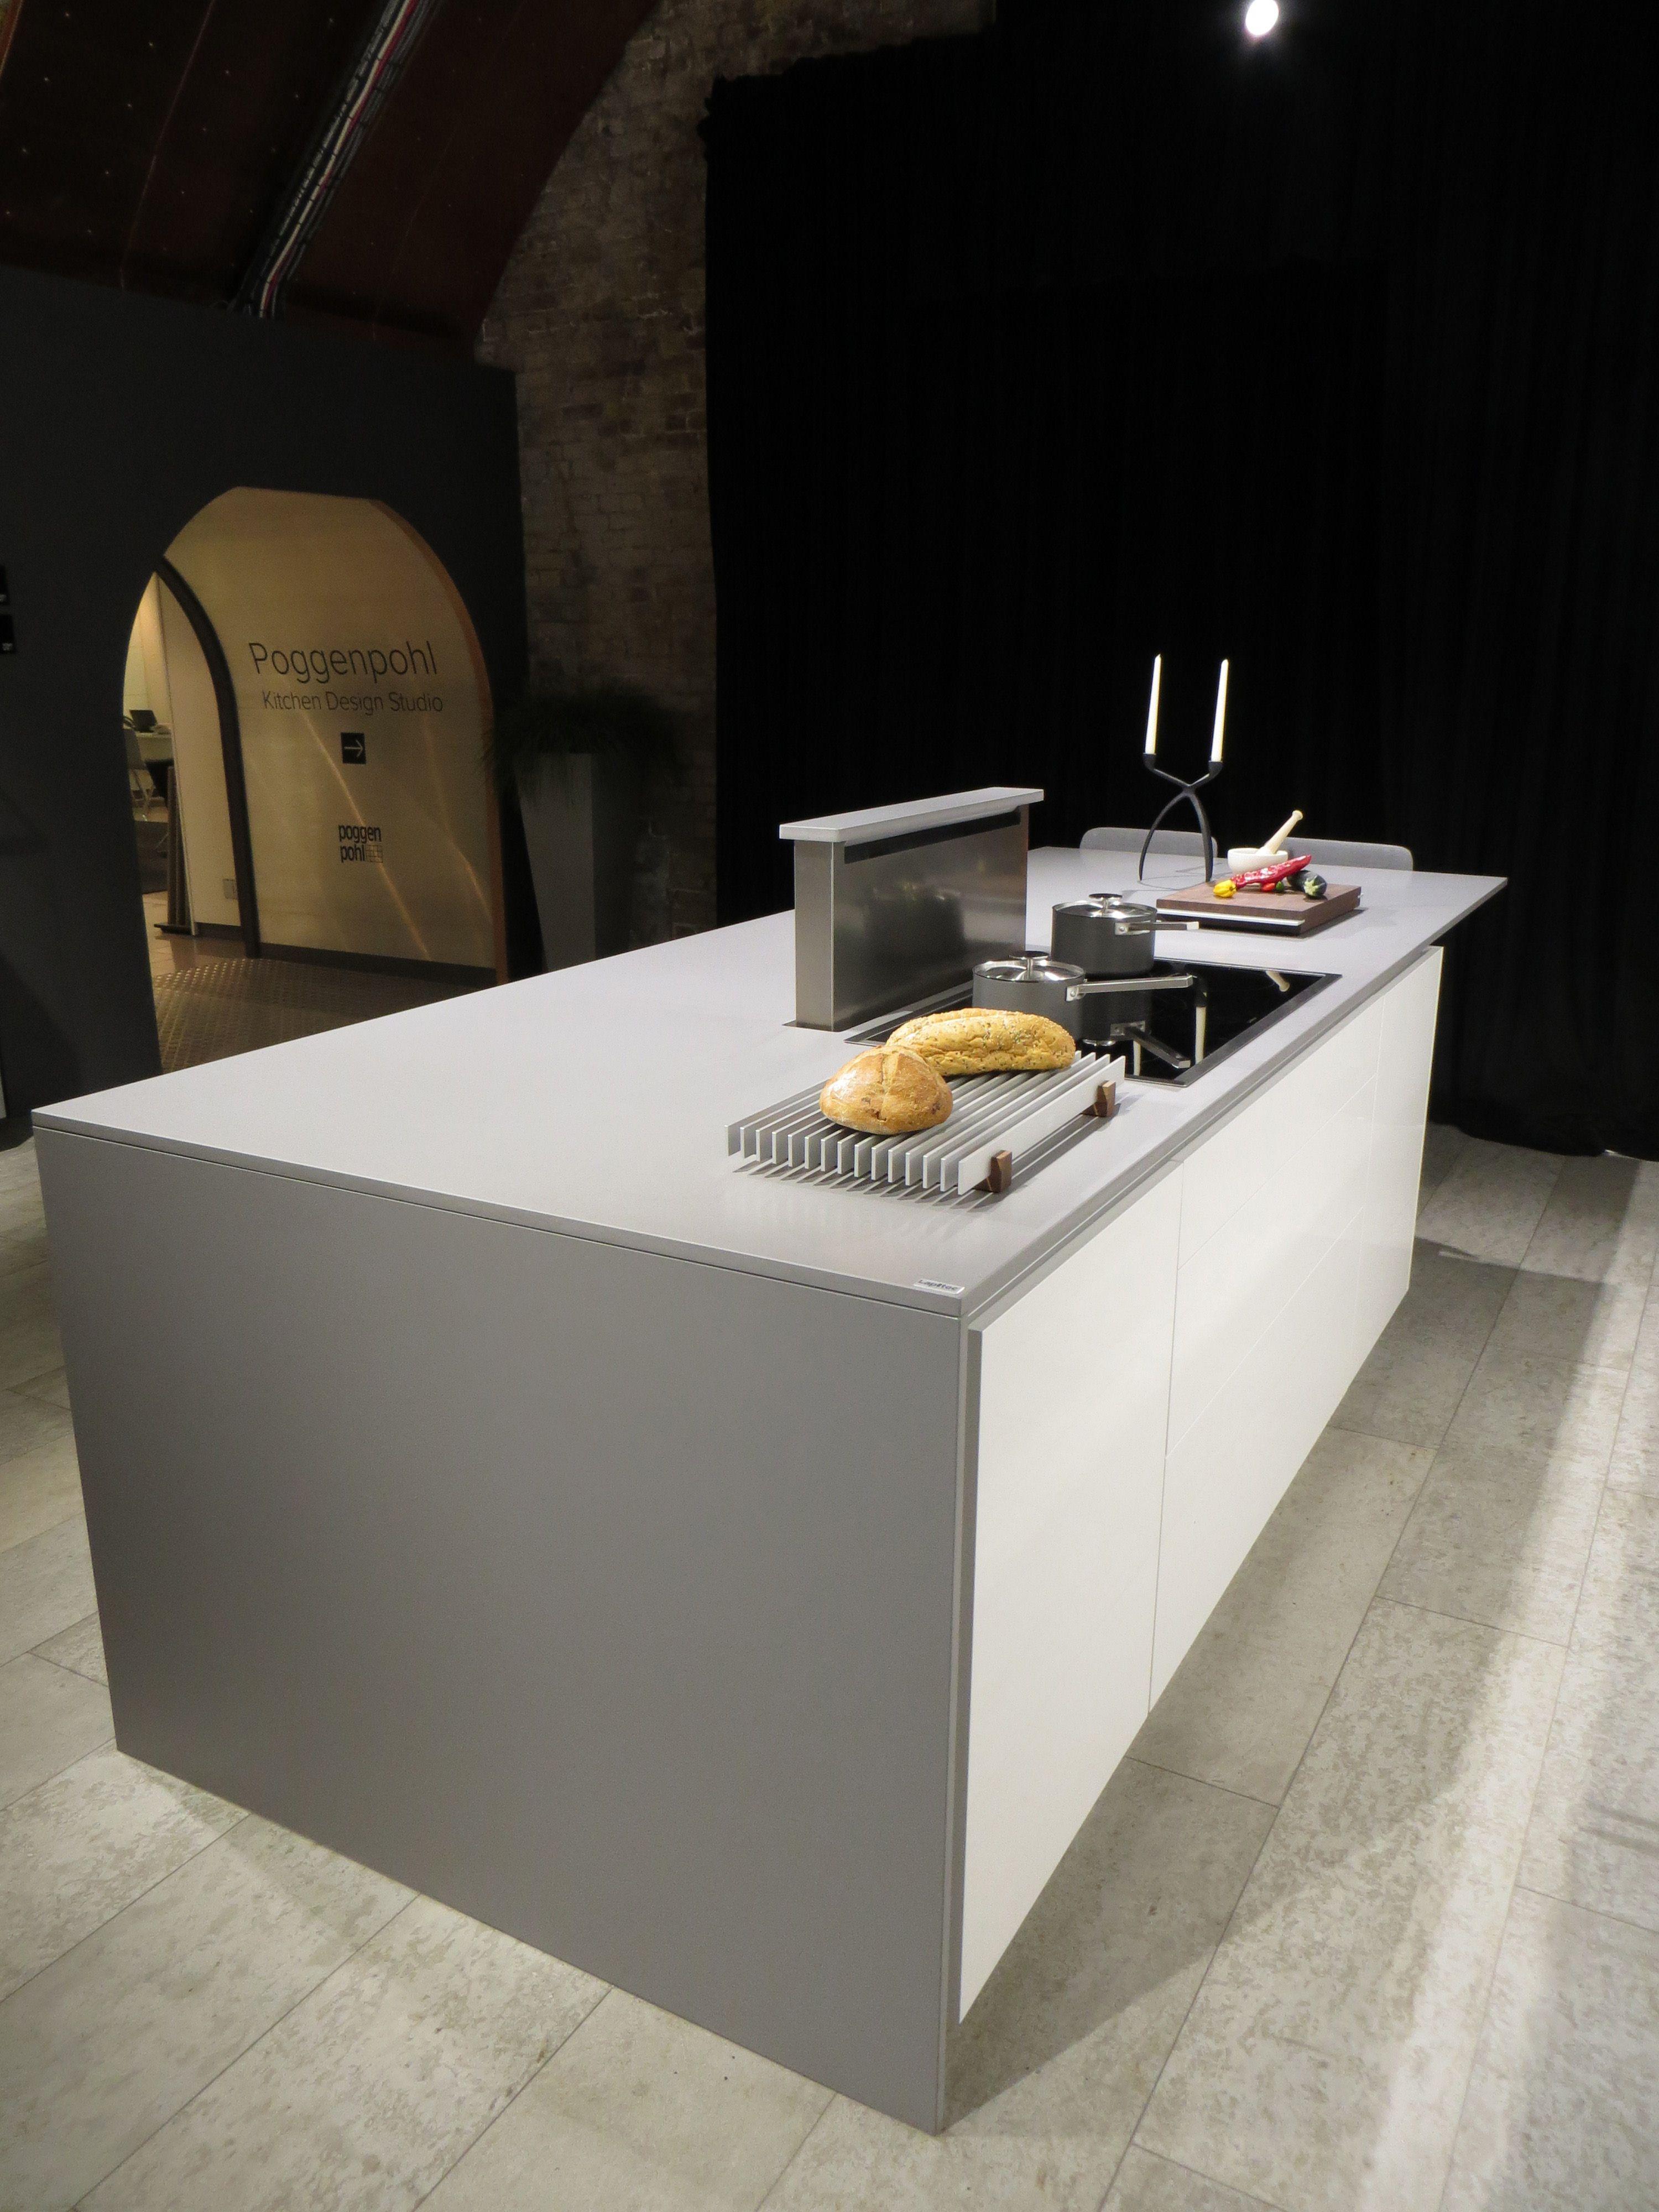 Introducing The New Lapitec Grigio Cemento Satin Finish Display